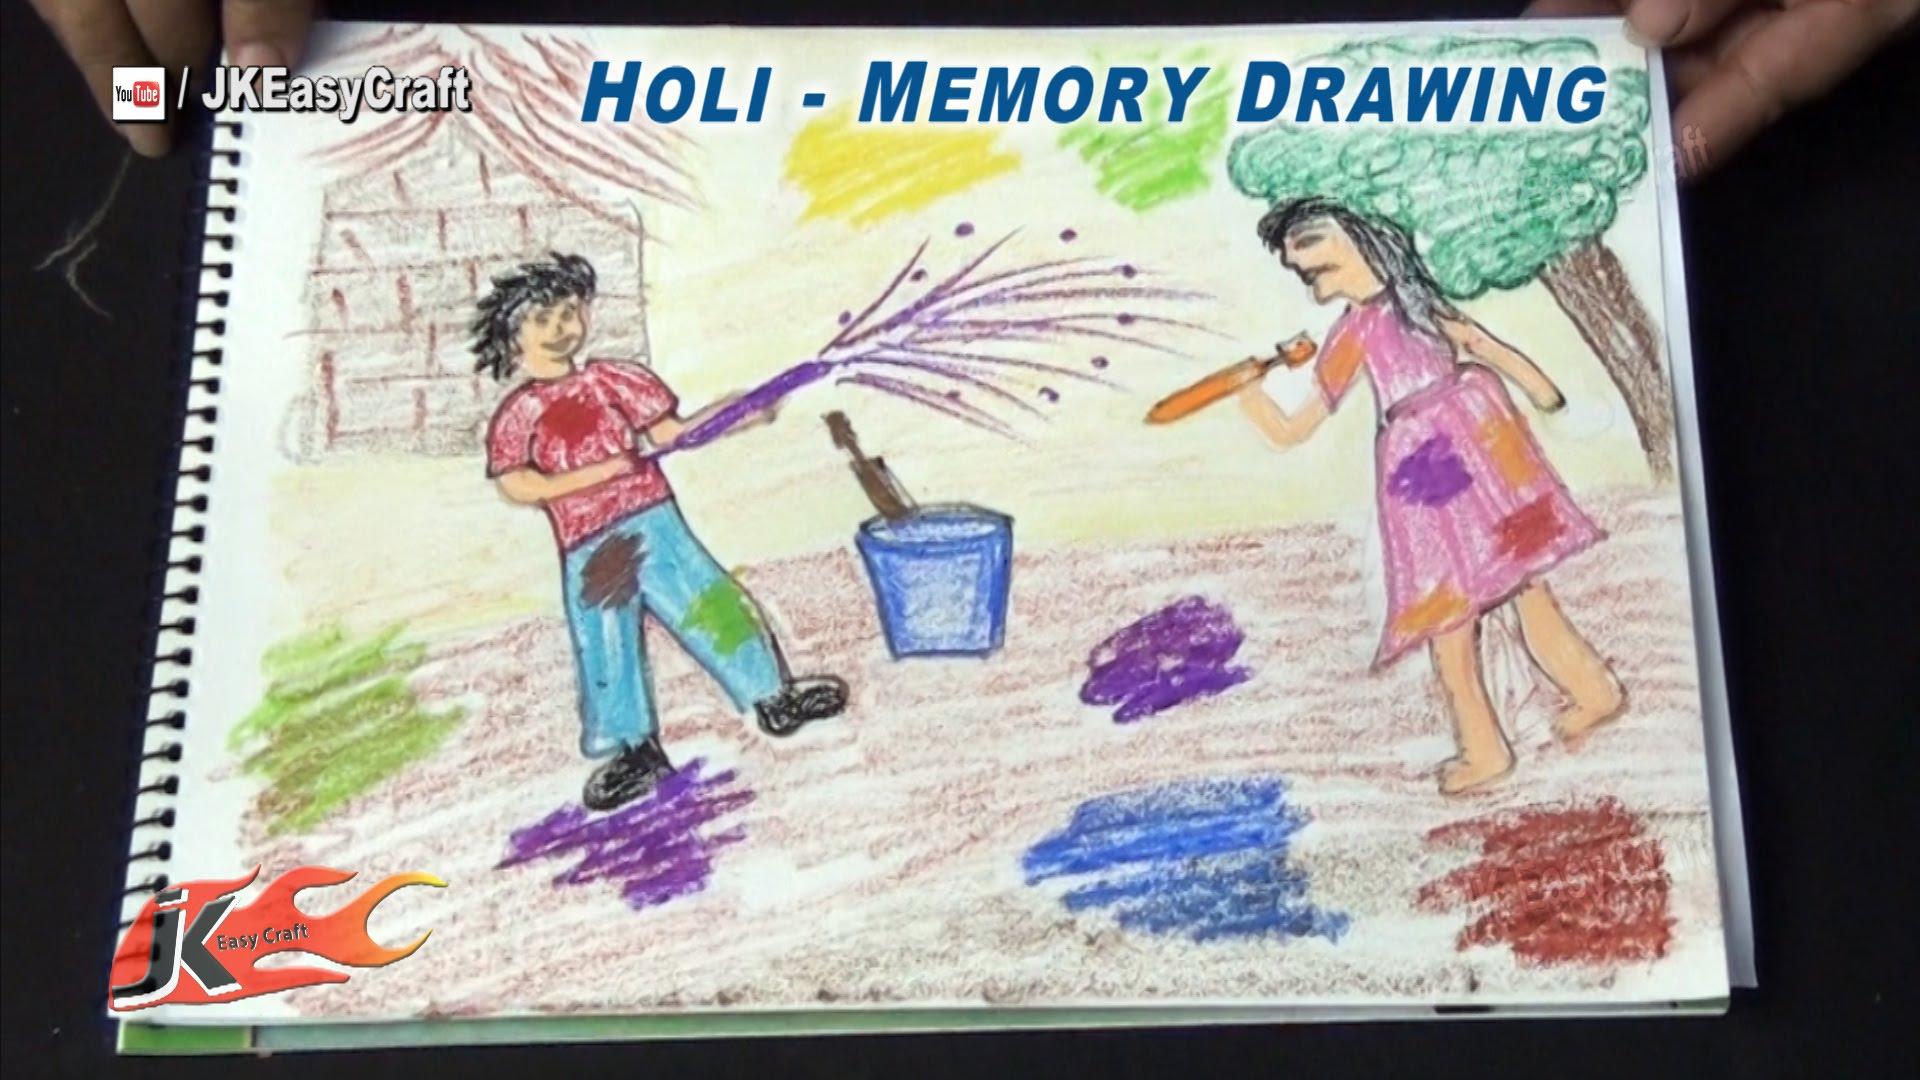 1920x1080 Holi Festival Memory Drawing School Project For Kids Jk Easy